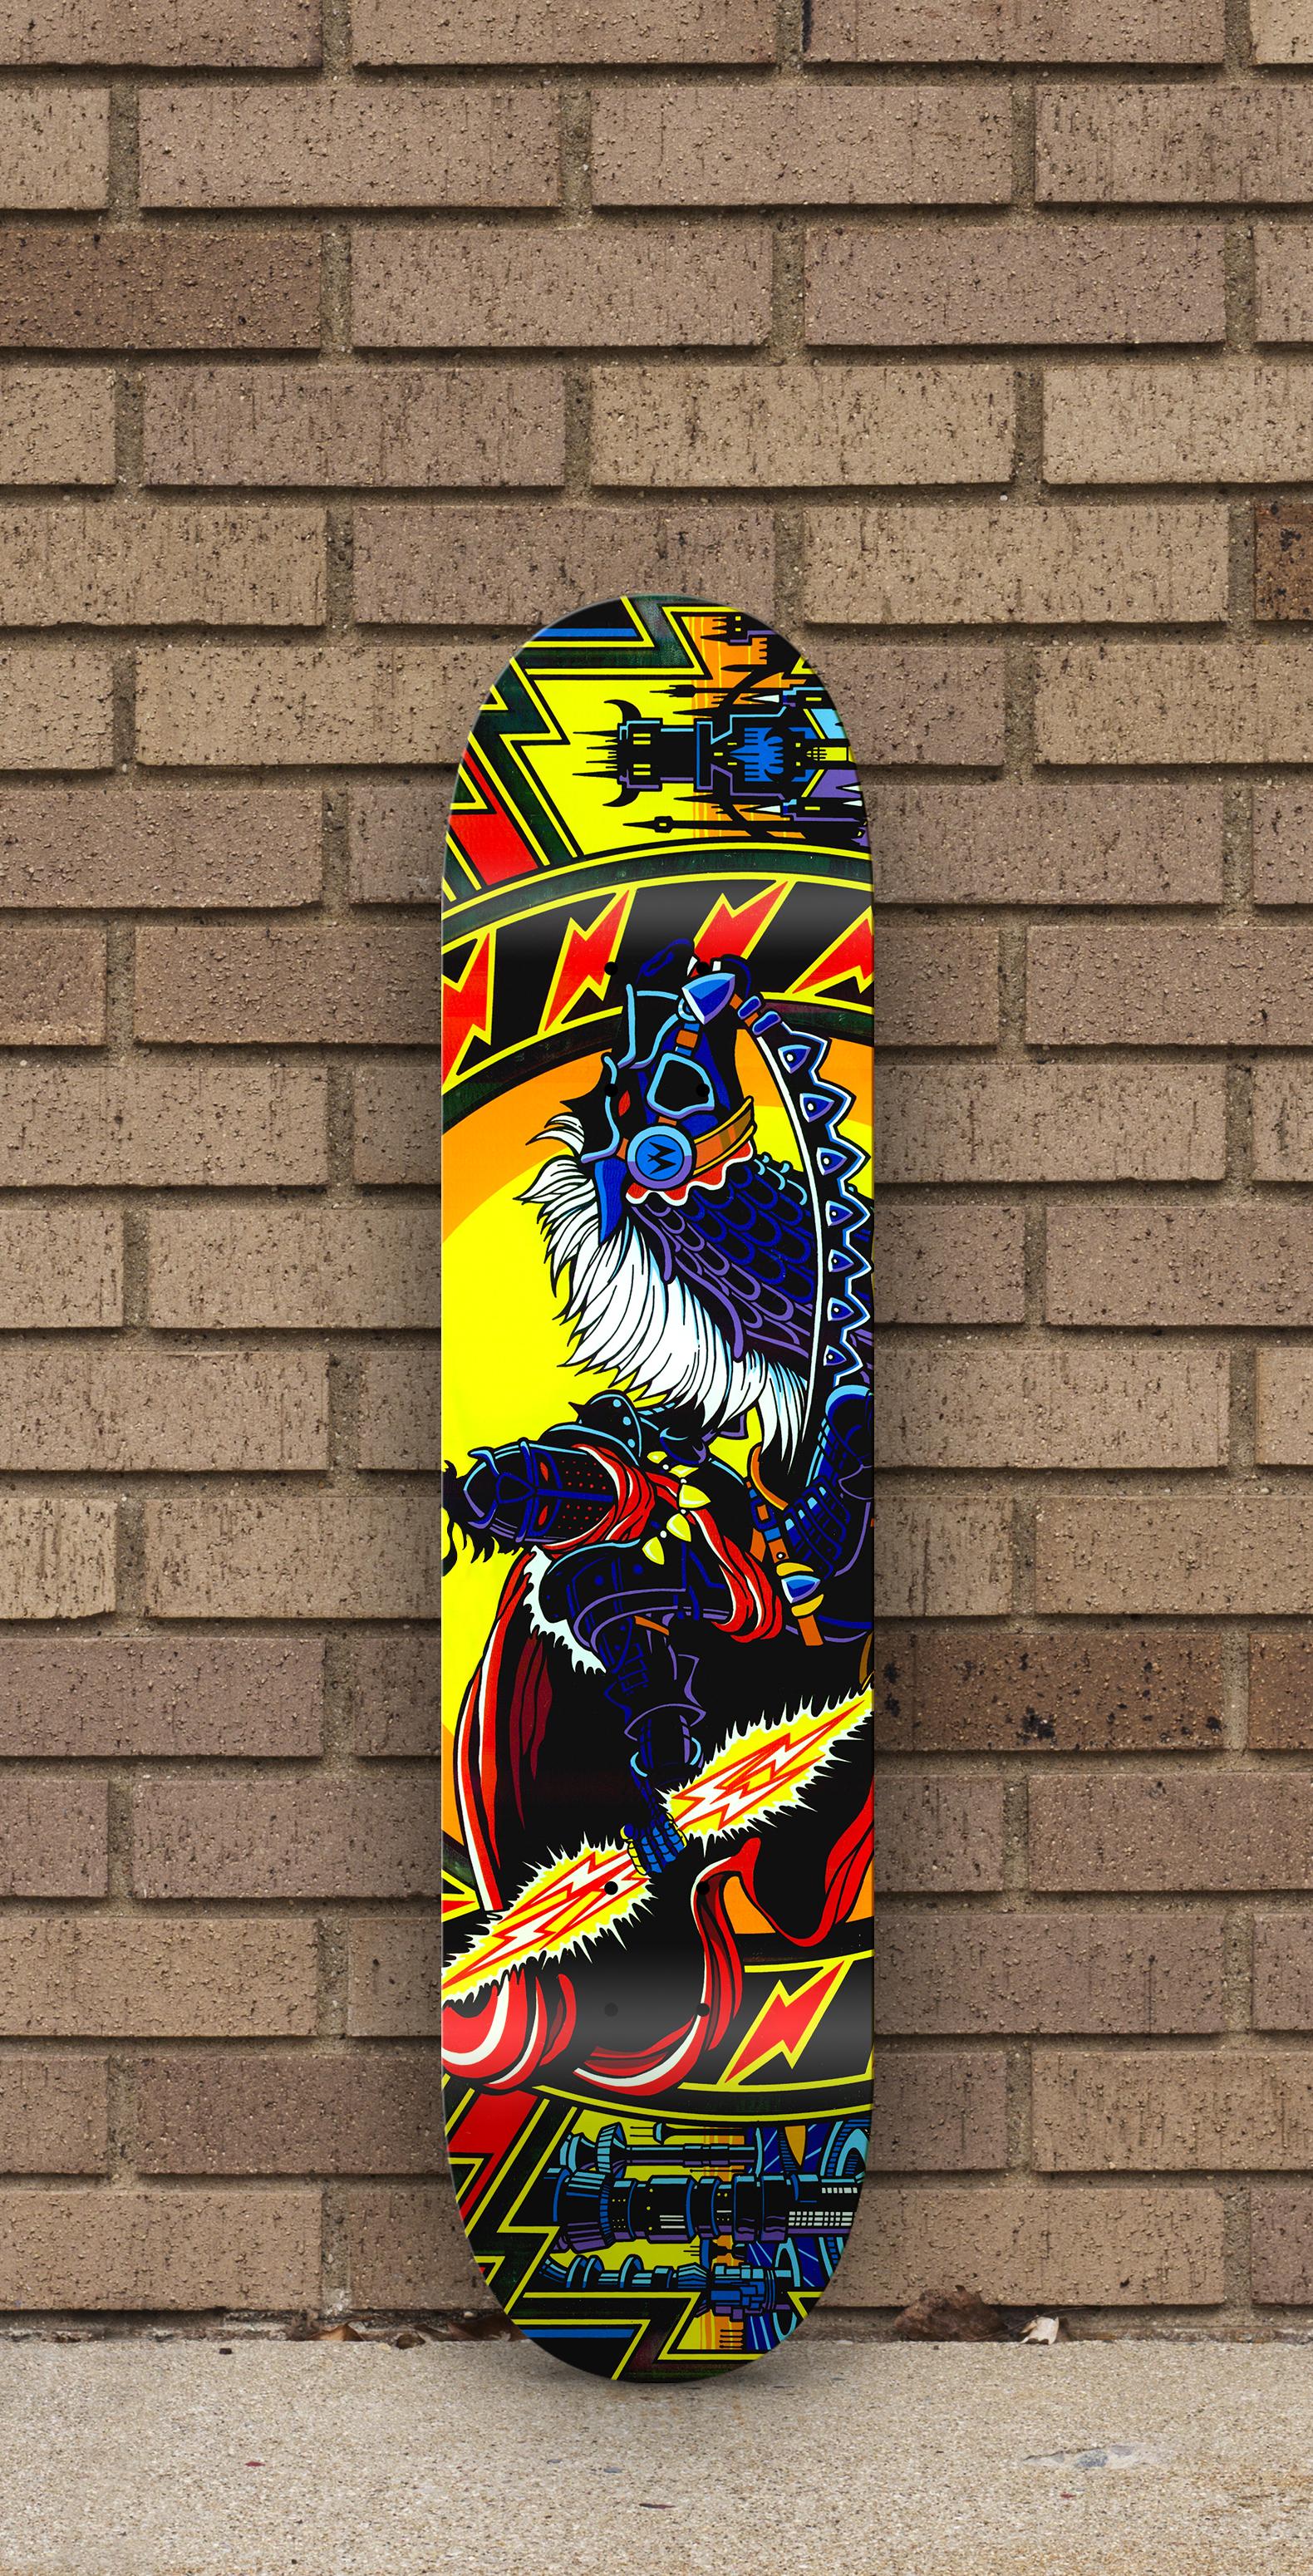 skate deck - black knight 2000.jpg